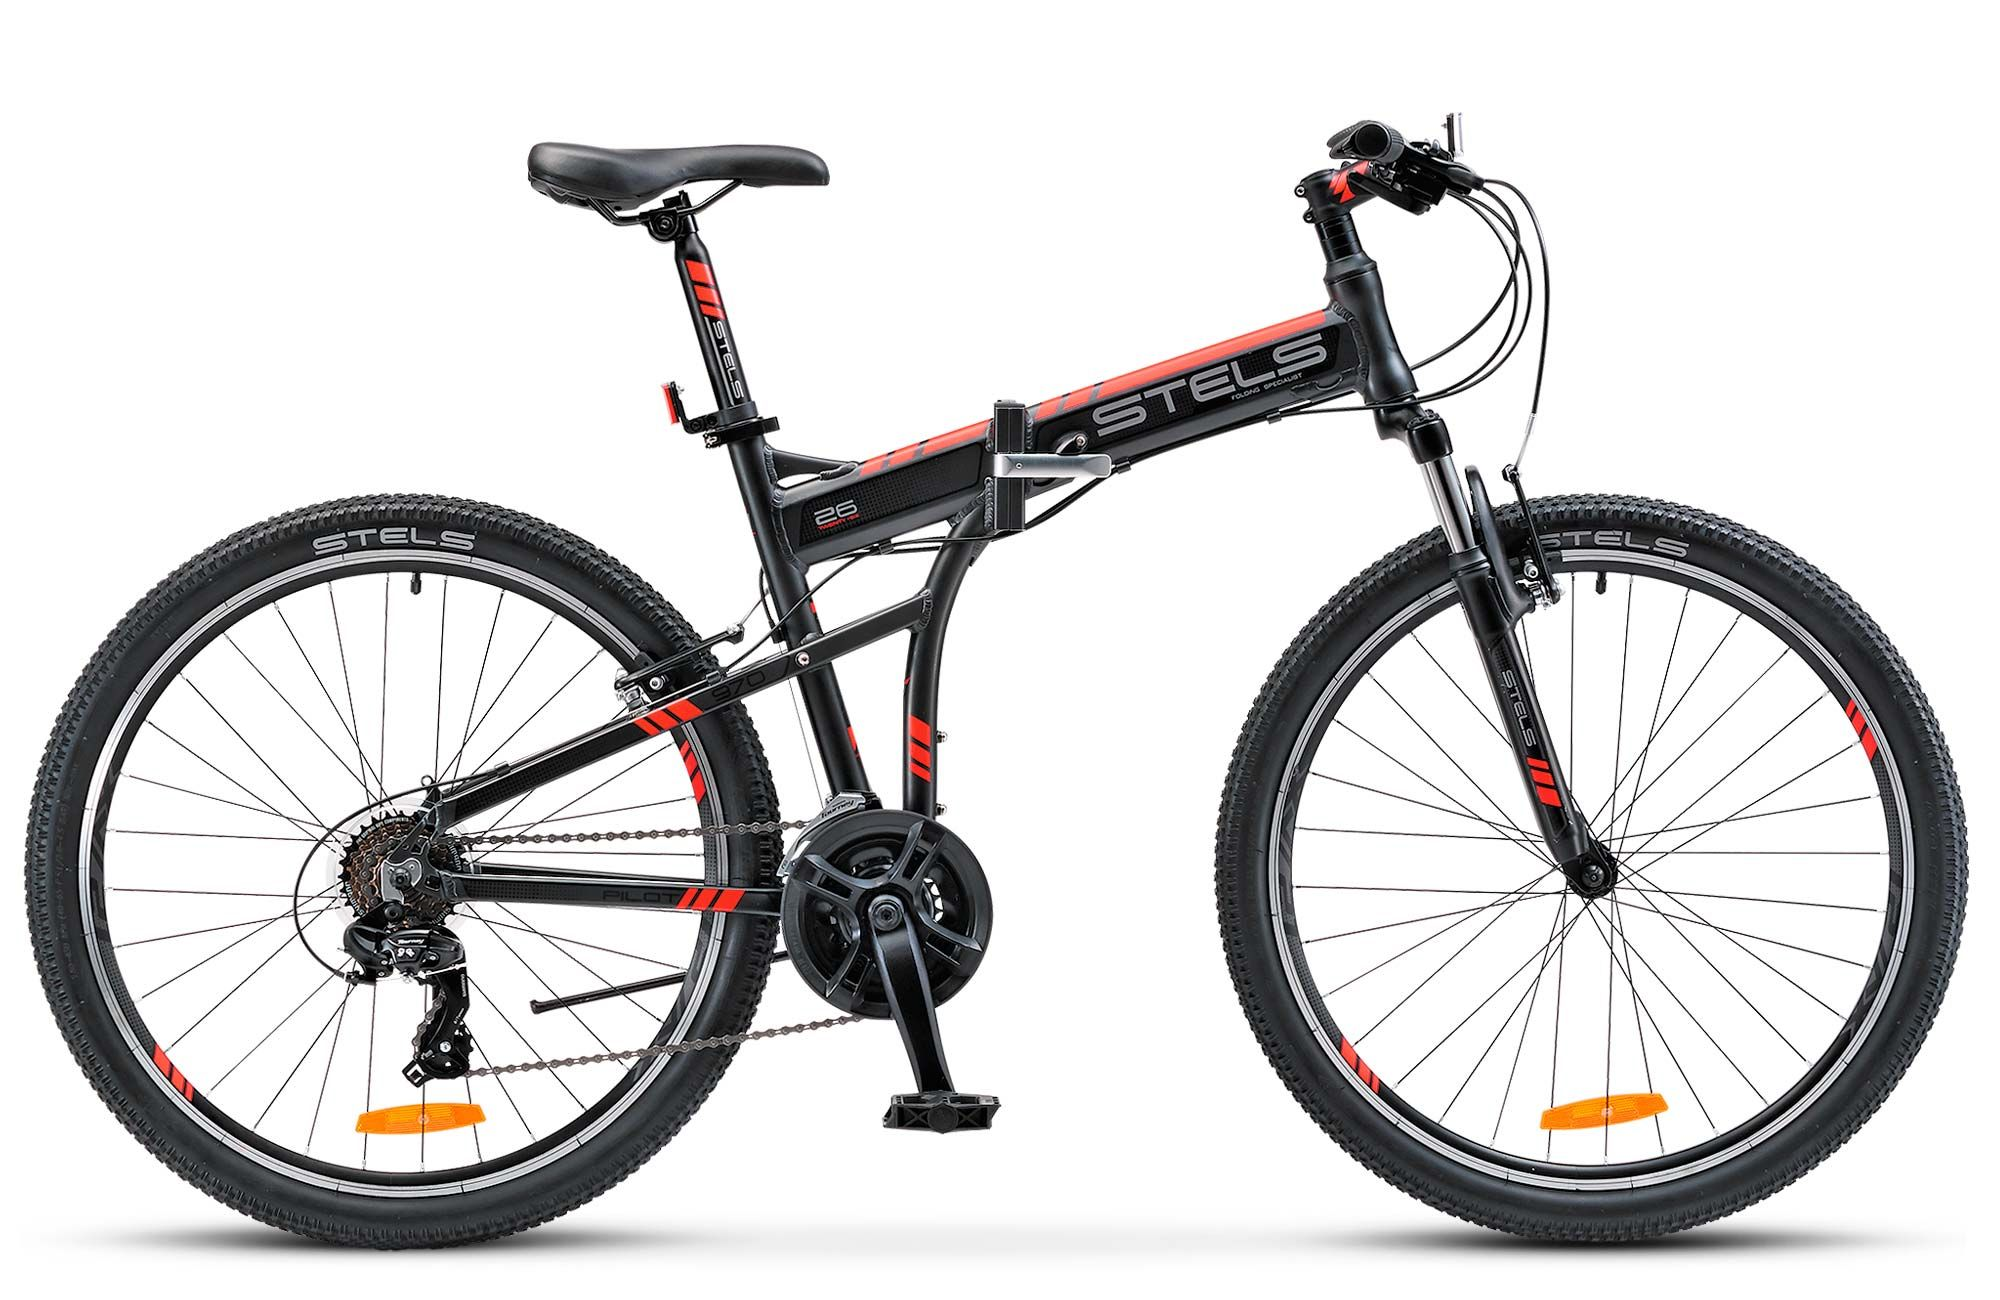 Велосипед Stels Pilot 970 V 2017,  Складные  - артикул:278633